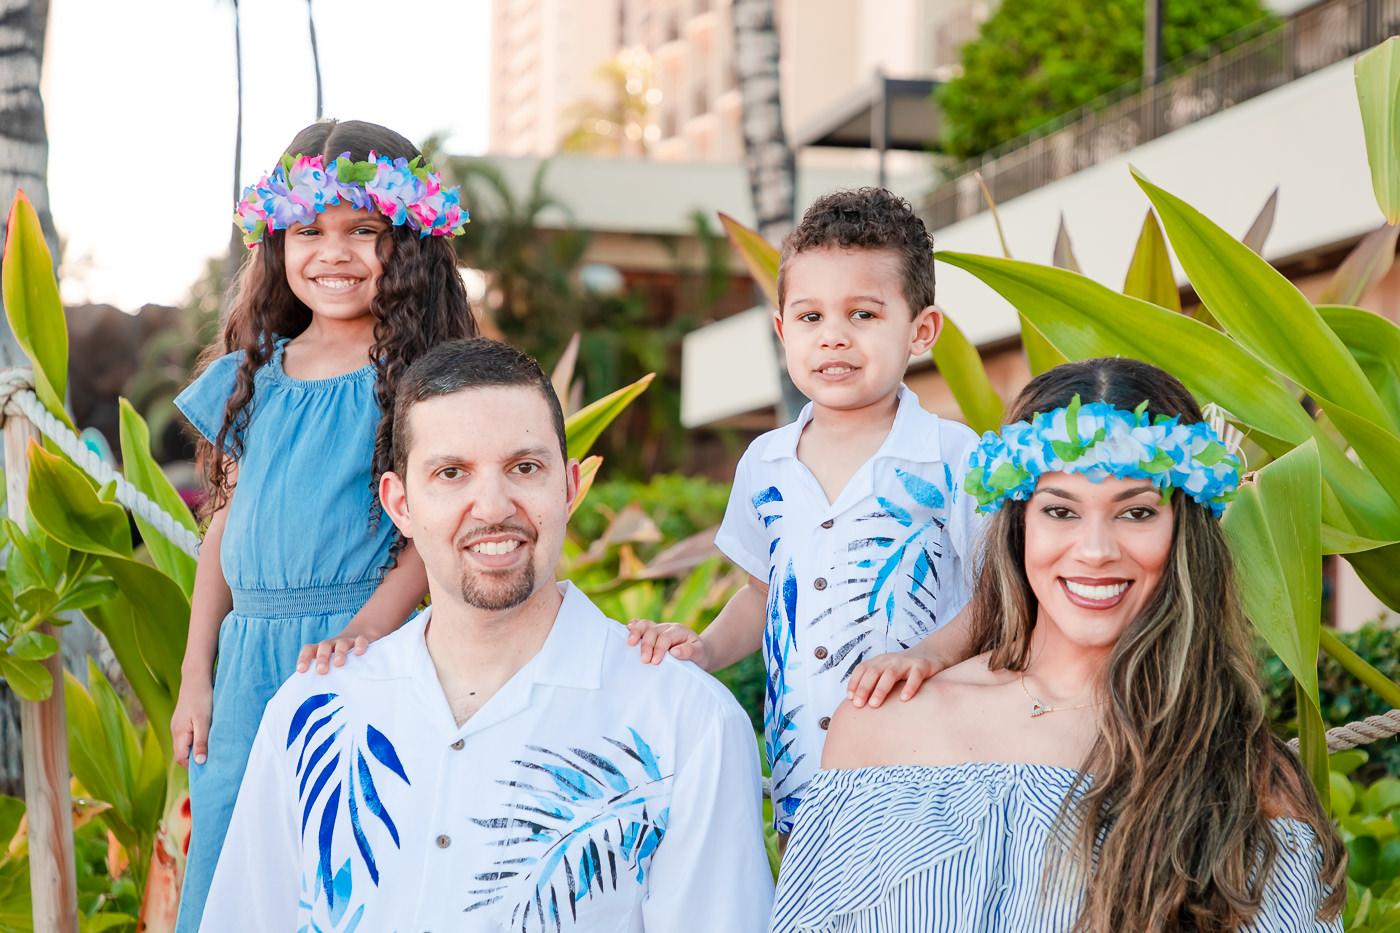 Oahu2019-2983.jpg